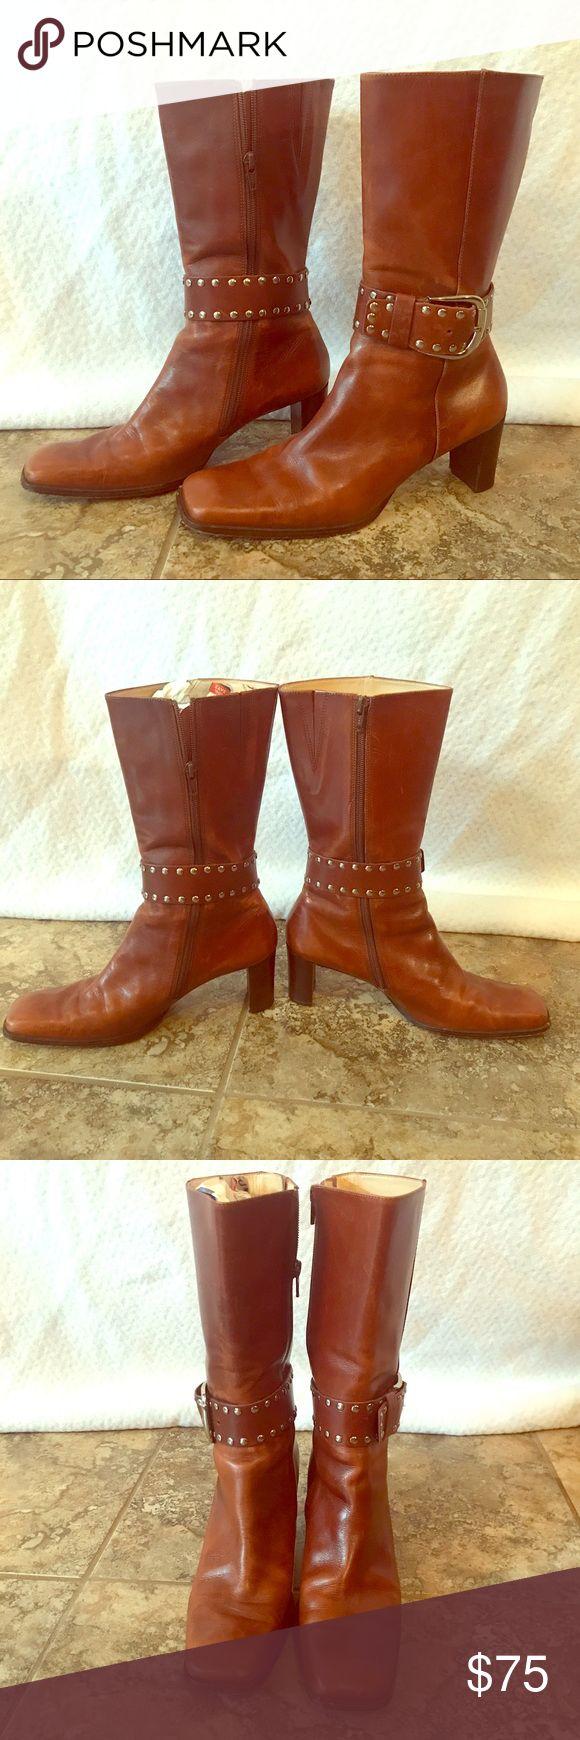 Buckled Cognac Leather Antonio Melani Boots Cognac Leather Antonio Melani - Love these boots! Well cared for! ANTONIO MELANI Shoes Heeled Boots